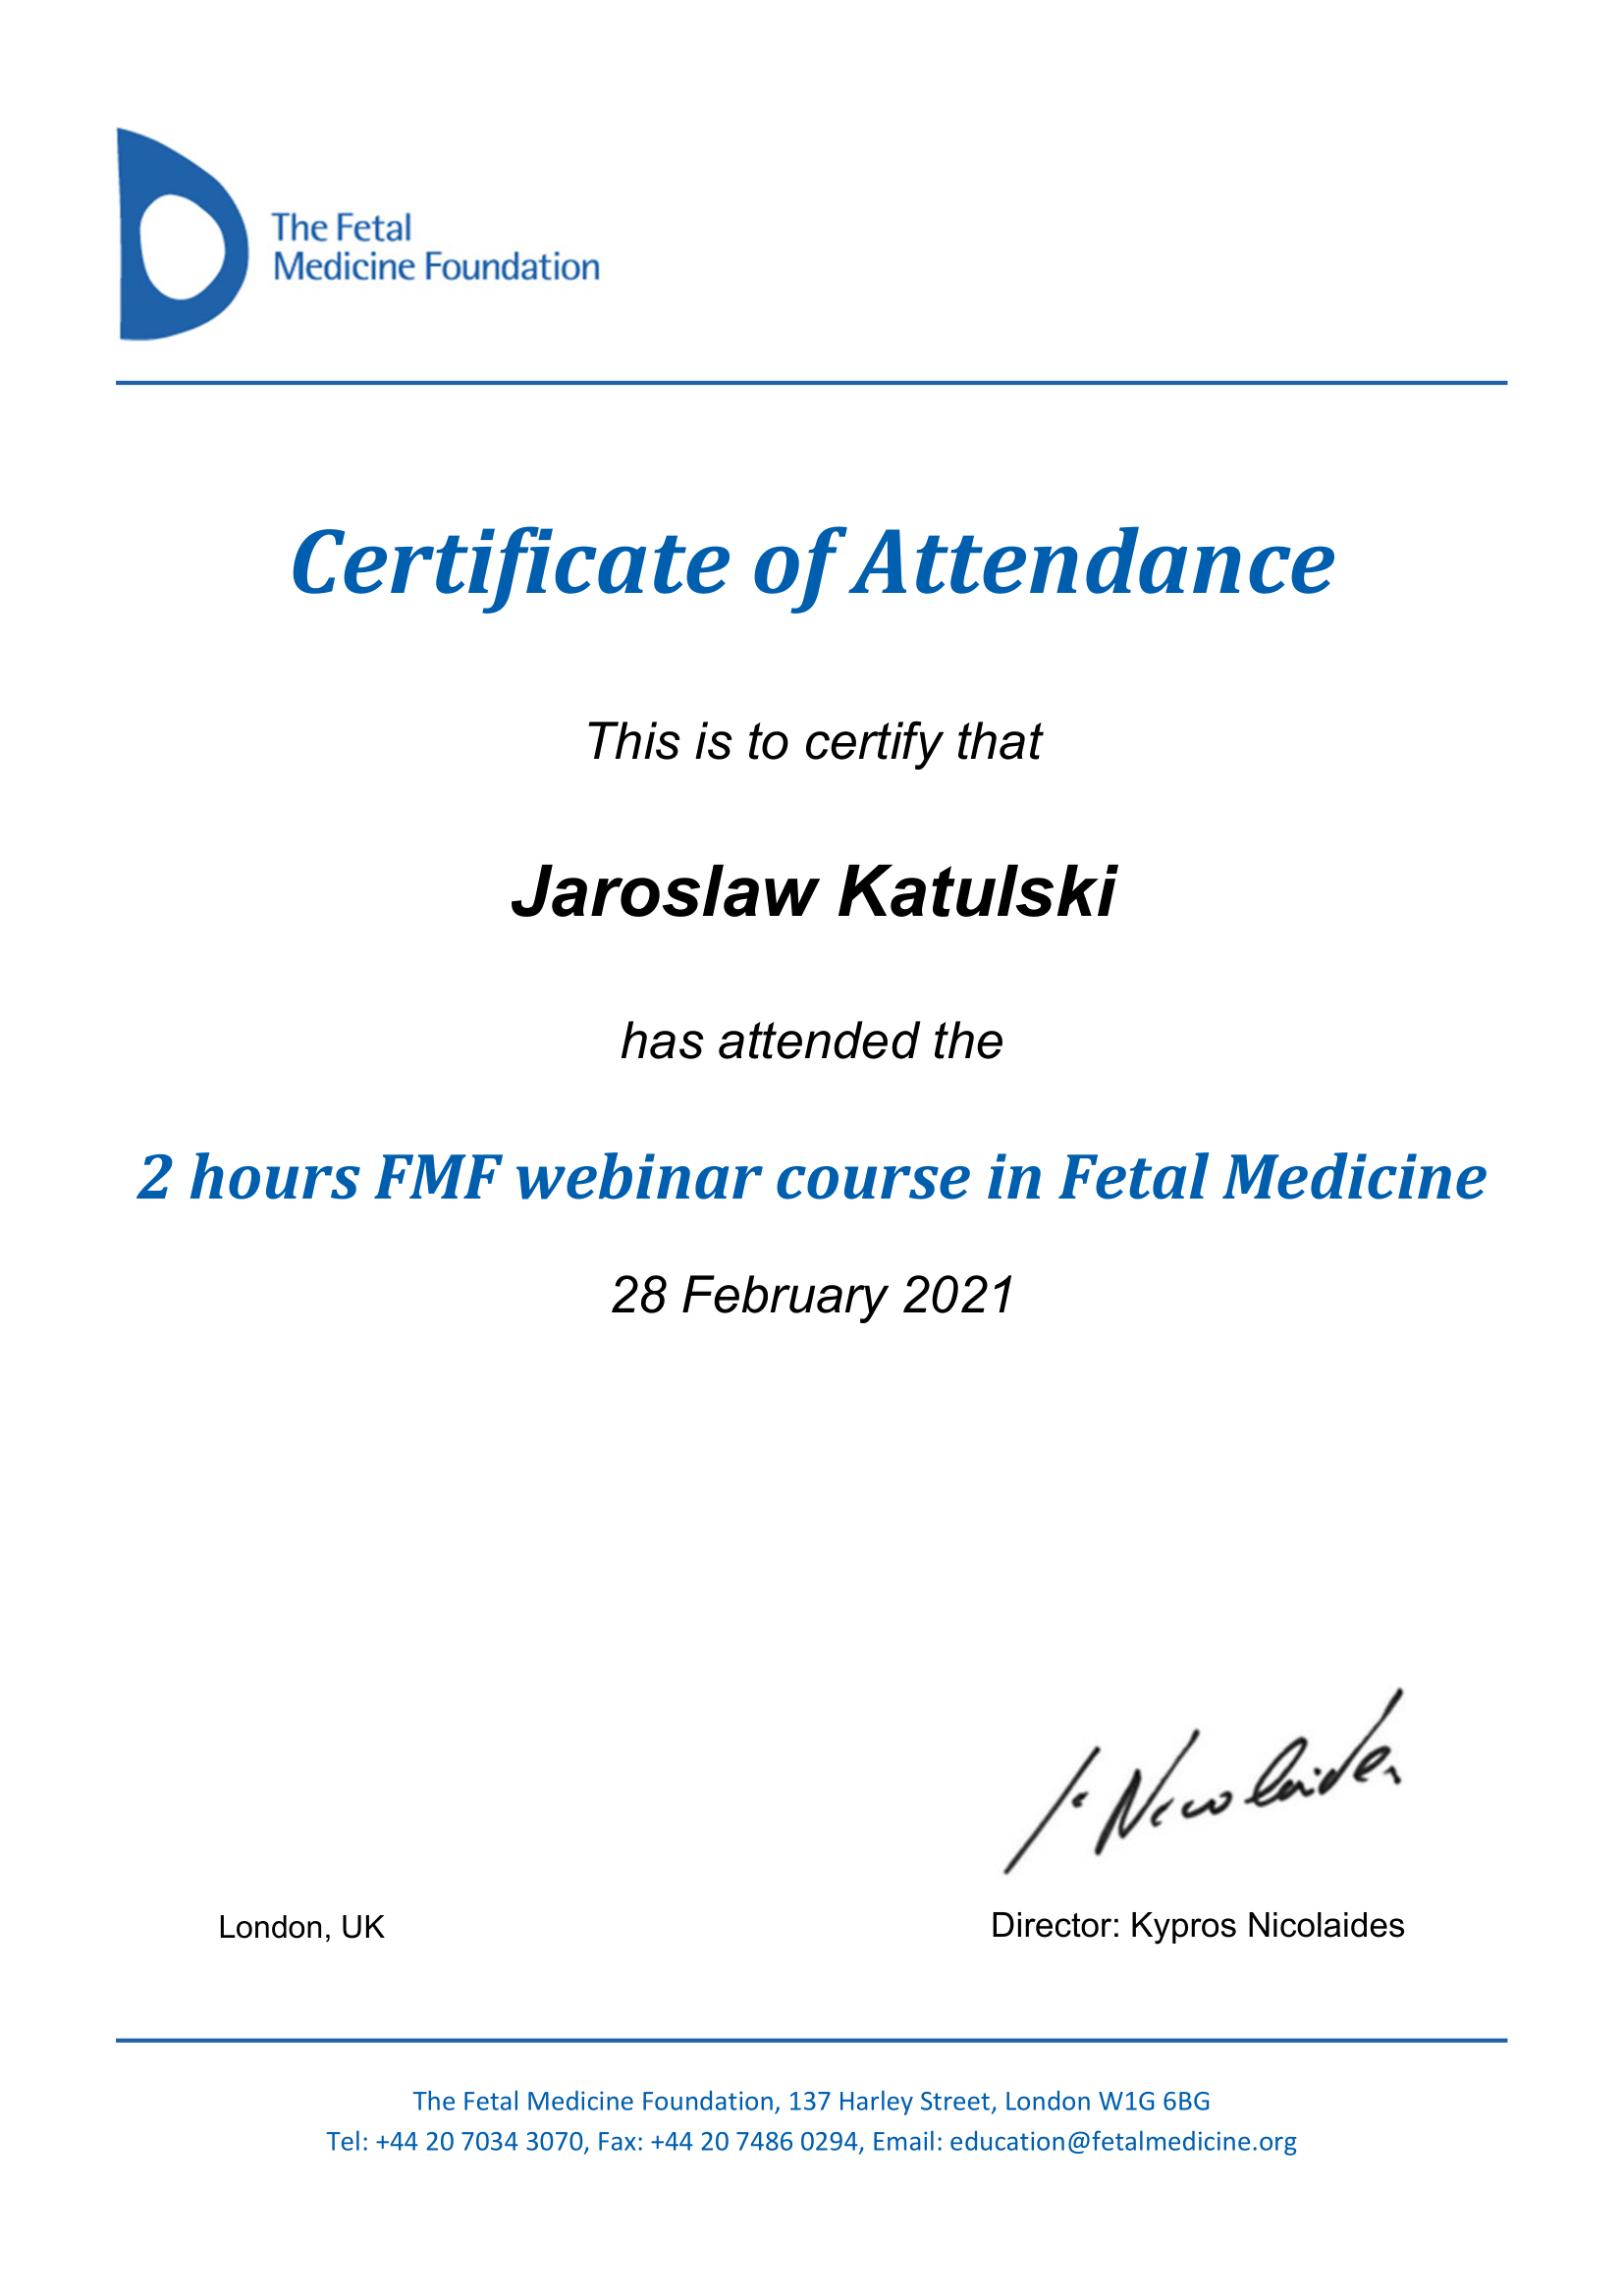 jaroslaw-katulski-certificate-1